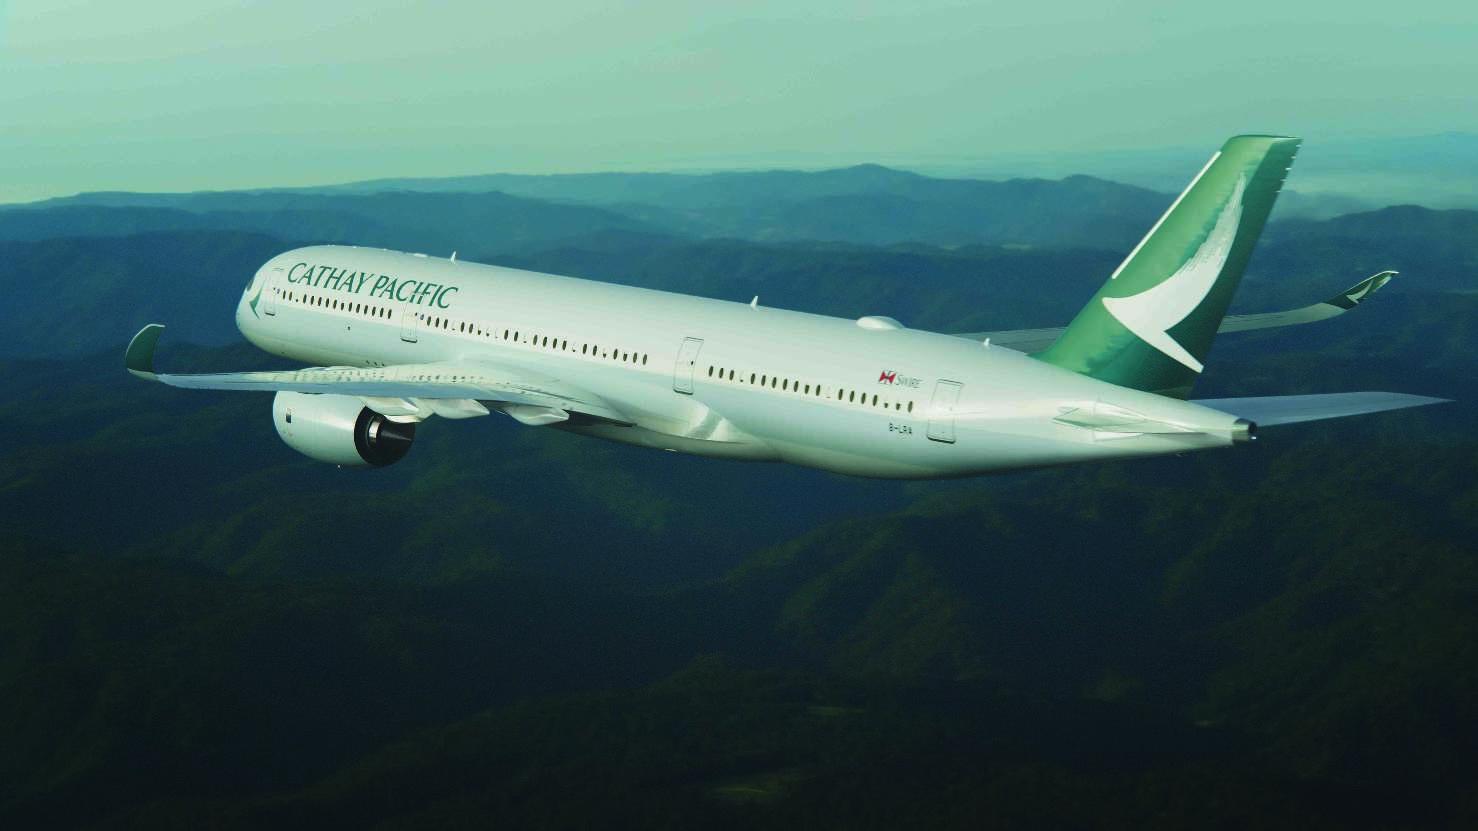 Cathay Pacific ajoutera un vol hebdo cet hiver entre Paris et Hong Kong